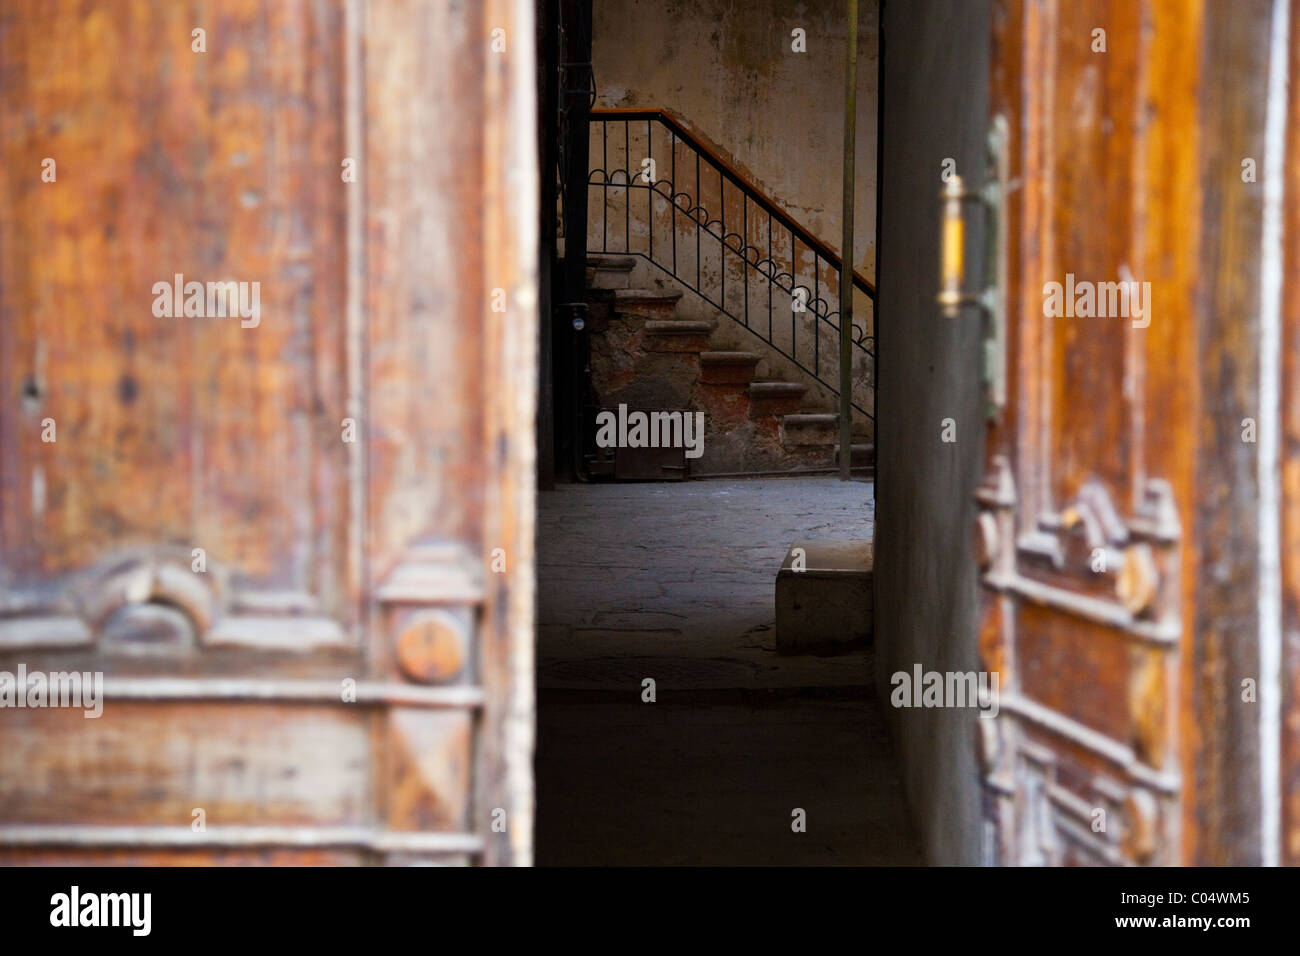 Doorway in the Old Town of Baku, Azerbaijan - Stock Image